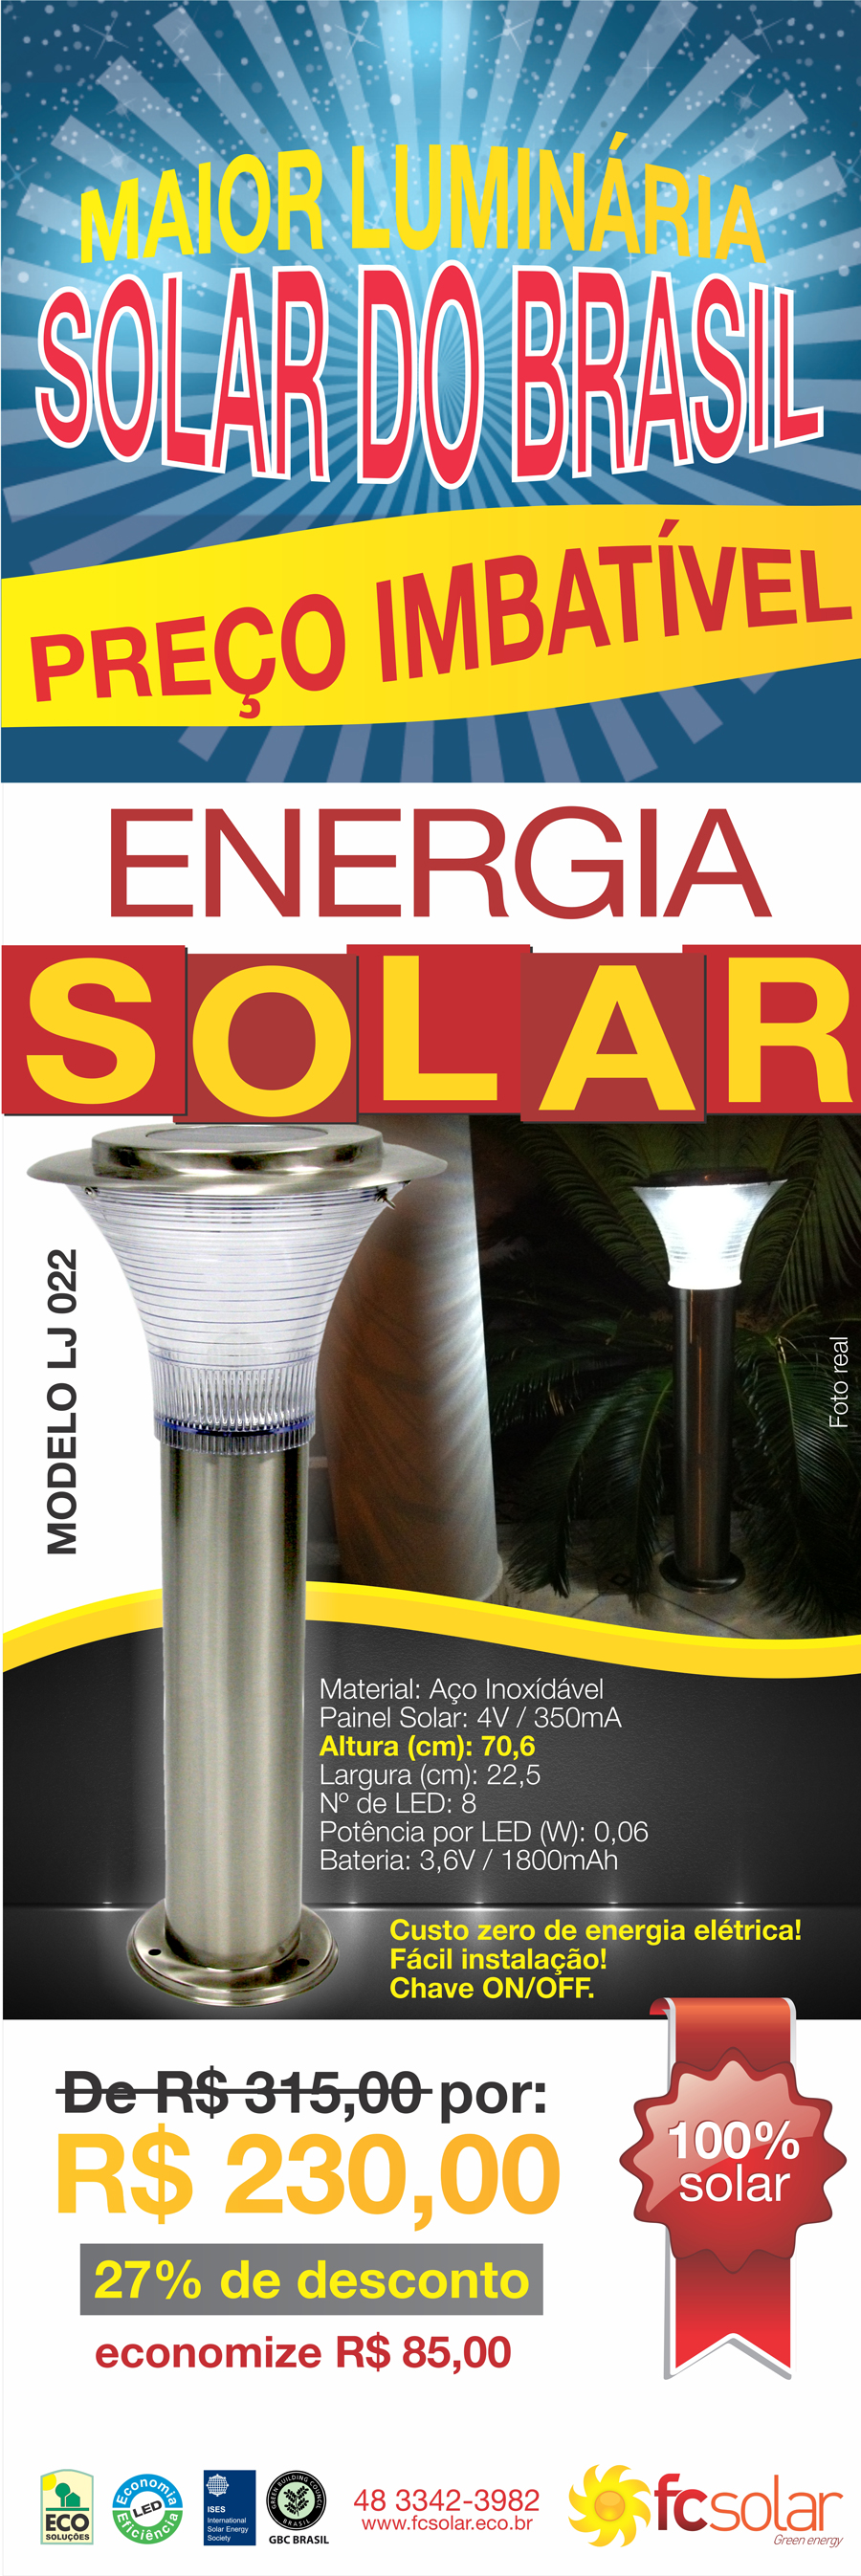 e-mail-luminaria-solar-022